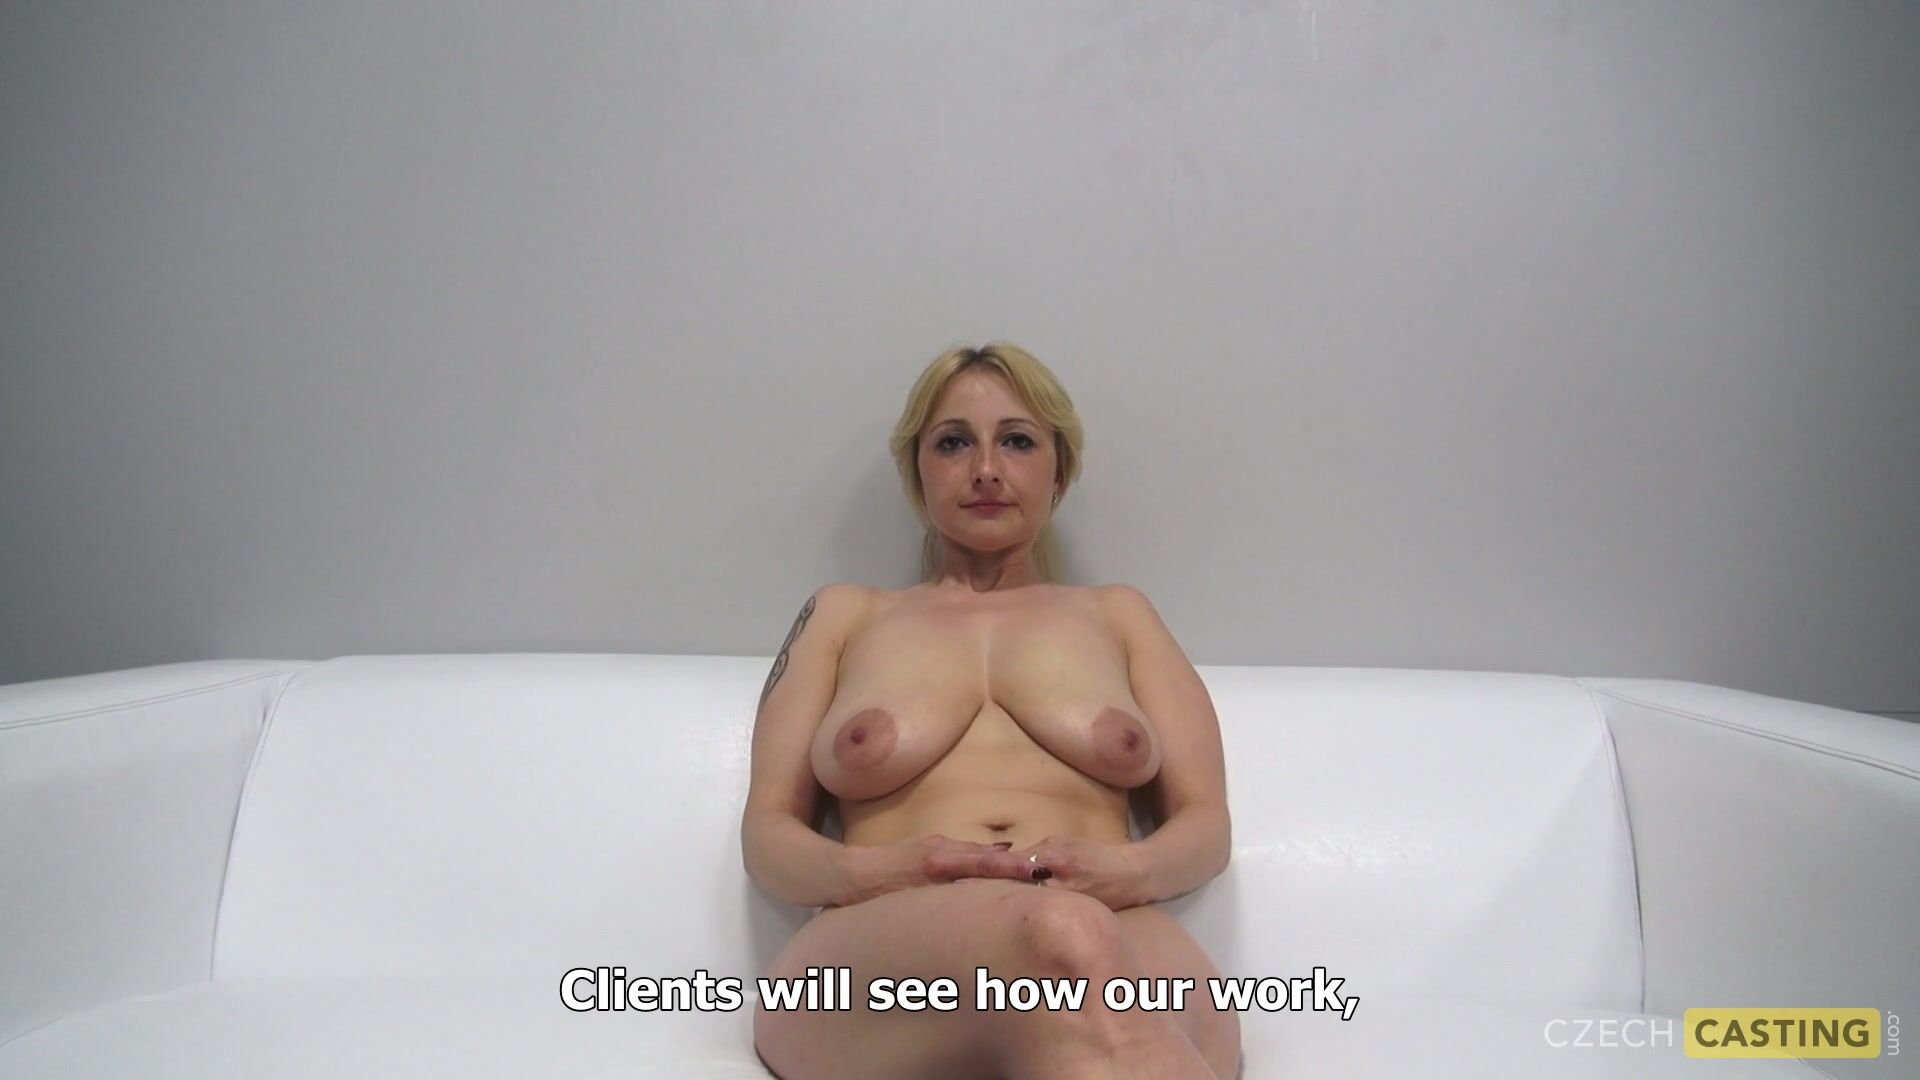 jana 1301 porn casting